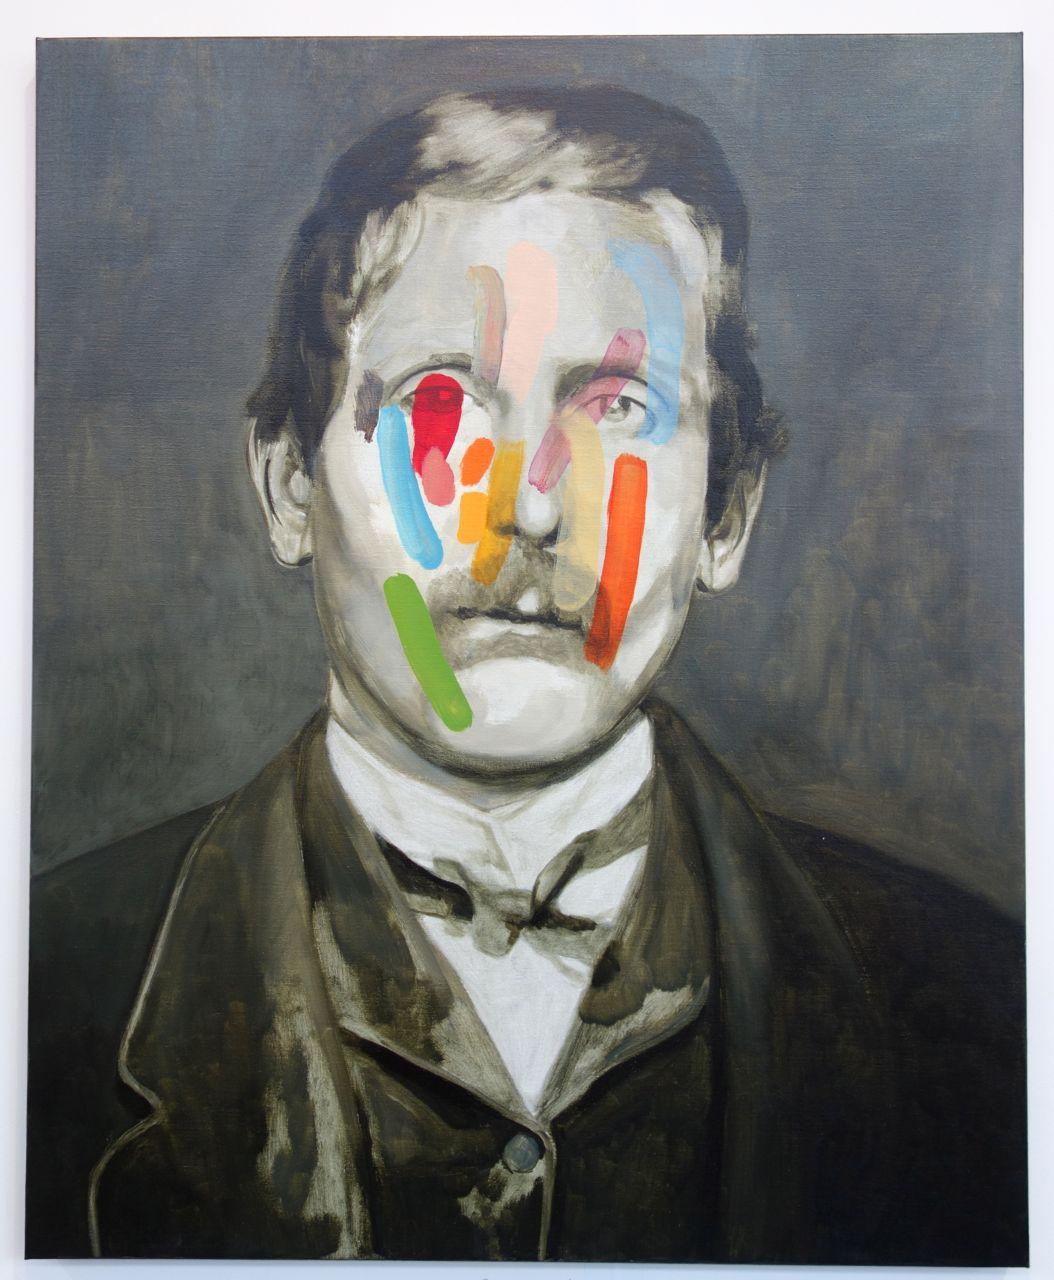 Guim Tió Zarraluki, 'No Name #5', 2016, Oil on linen, 100 x 81 cm, Yiri Arts (Taiwan)